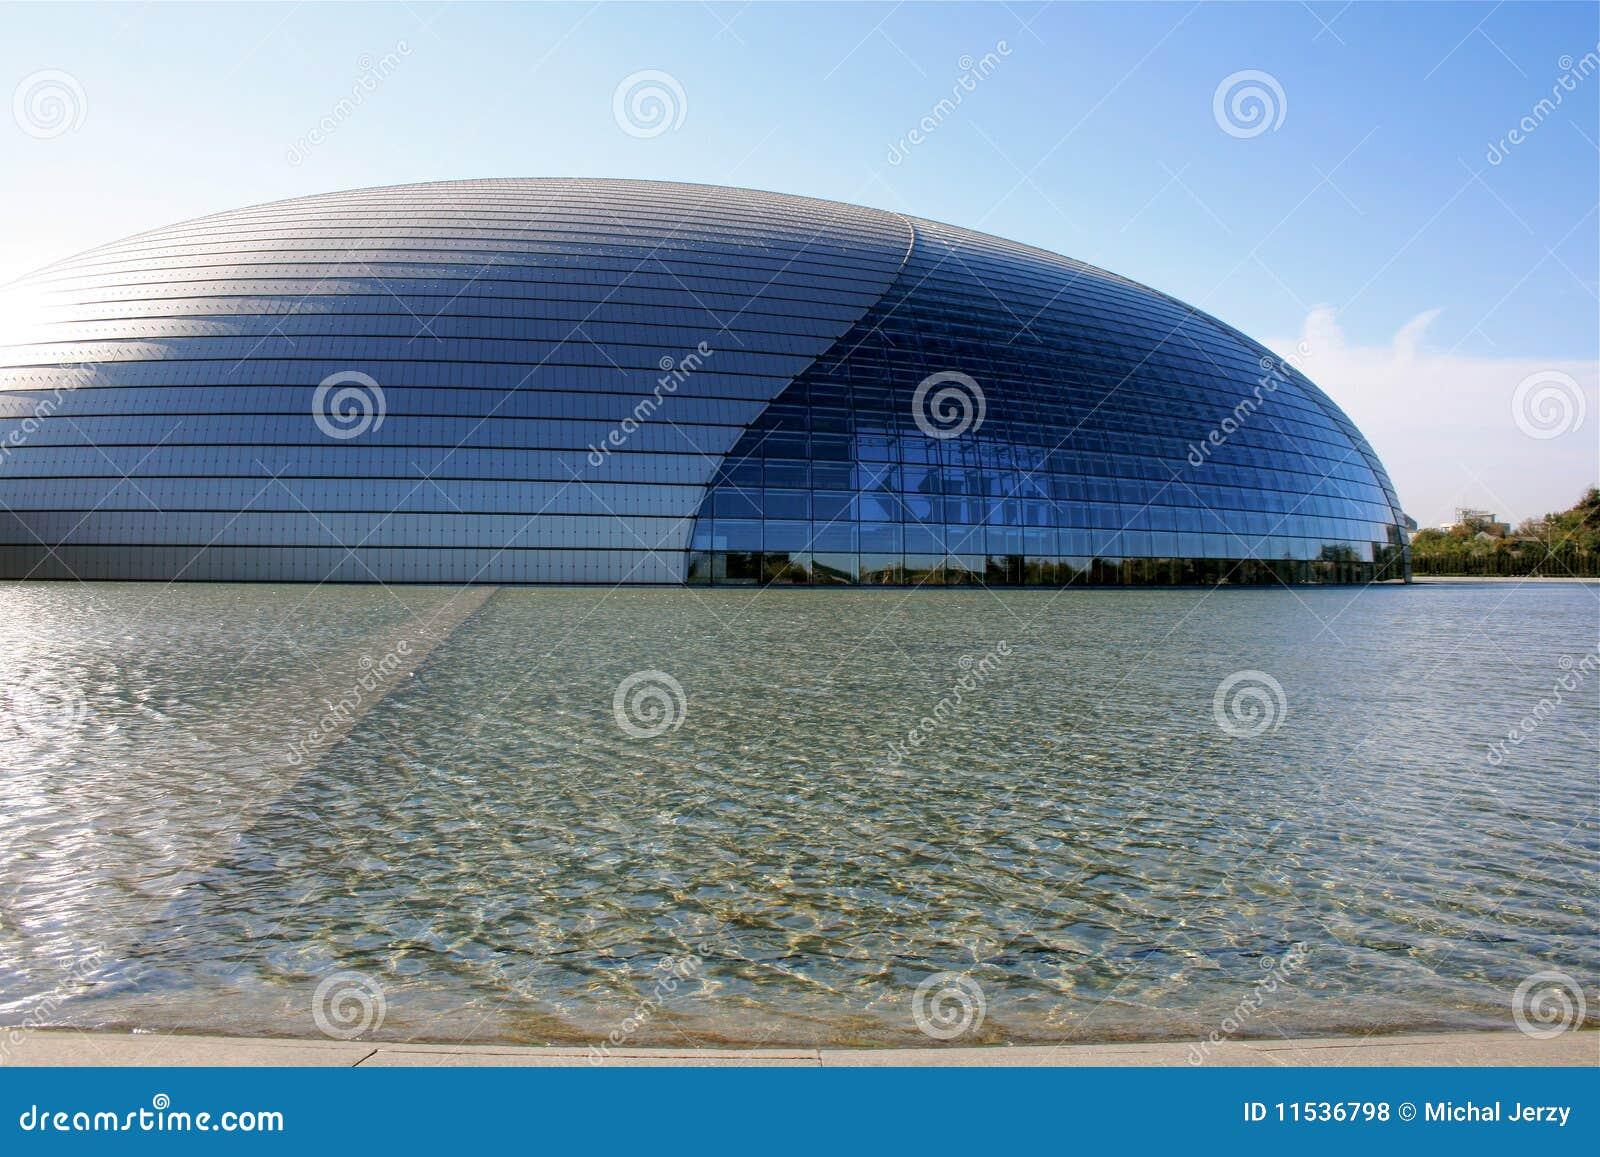 Chinese design beijing opera house royalty free stock for Beijing opera house architect